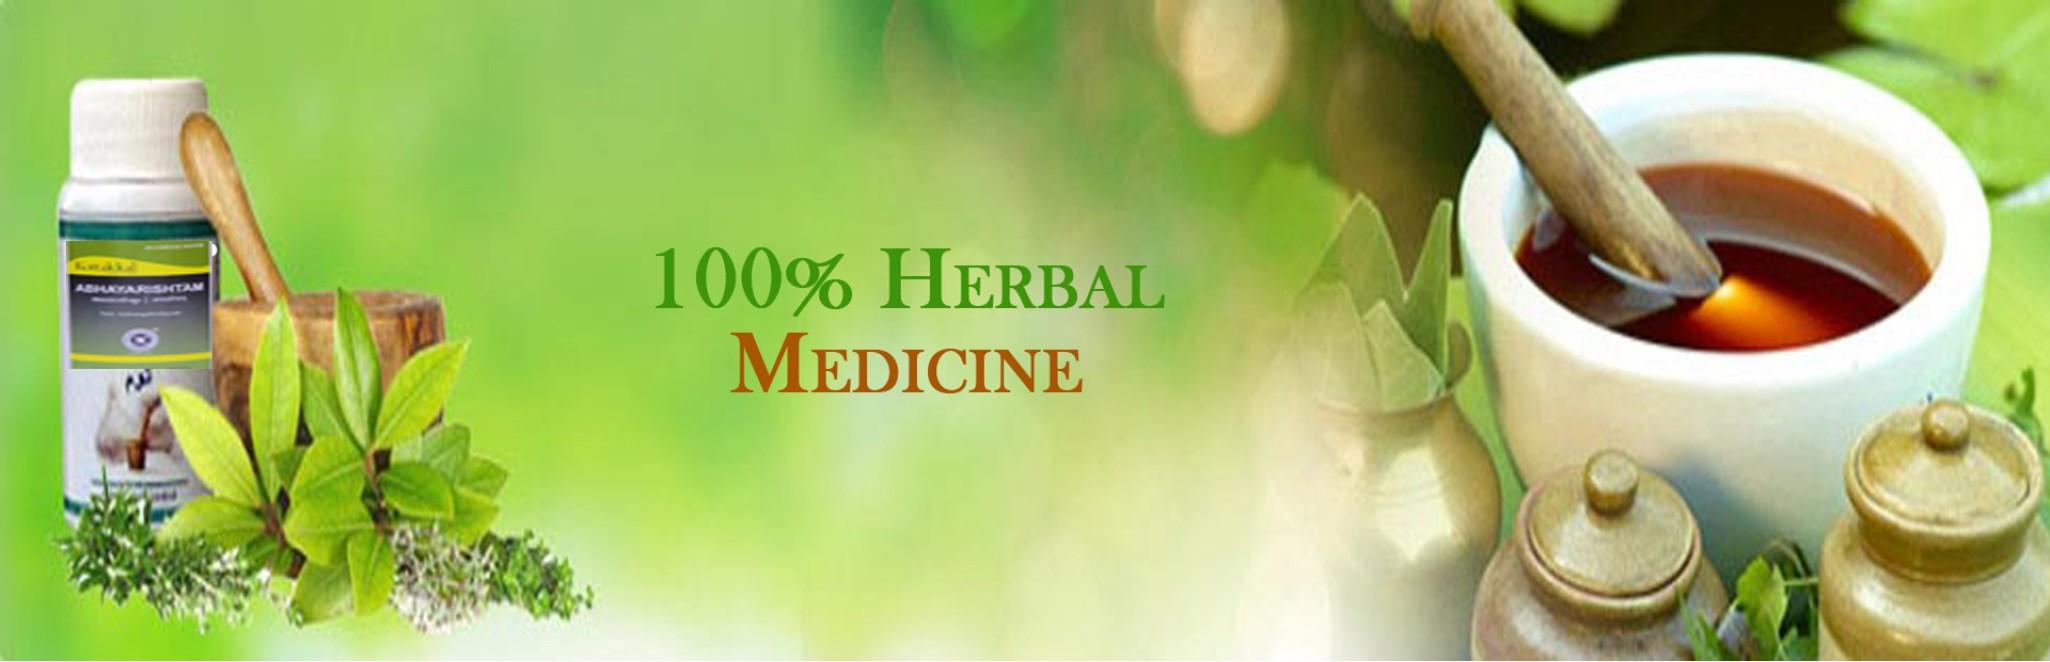 100% Herbal Medicines